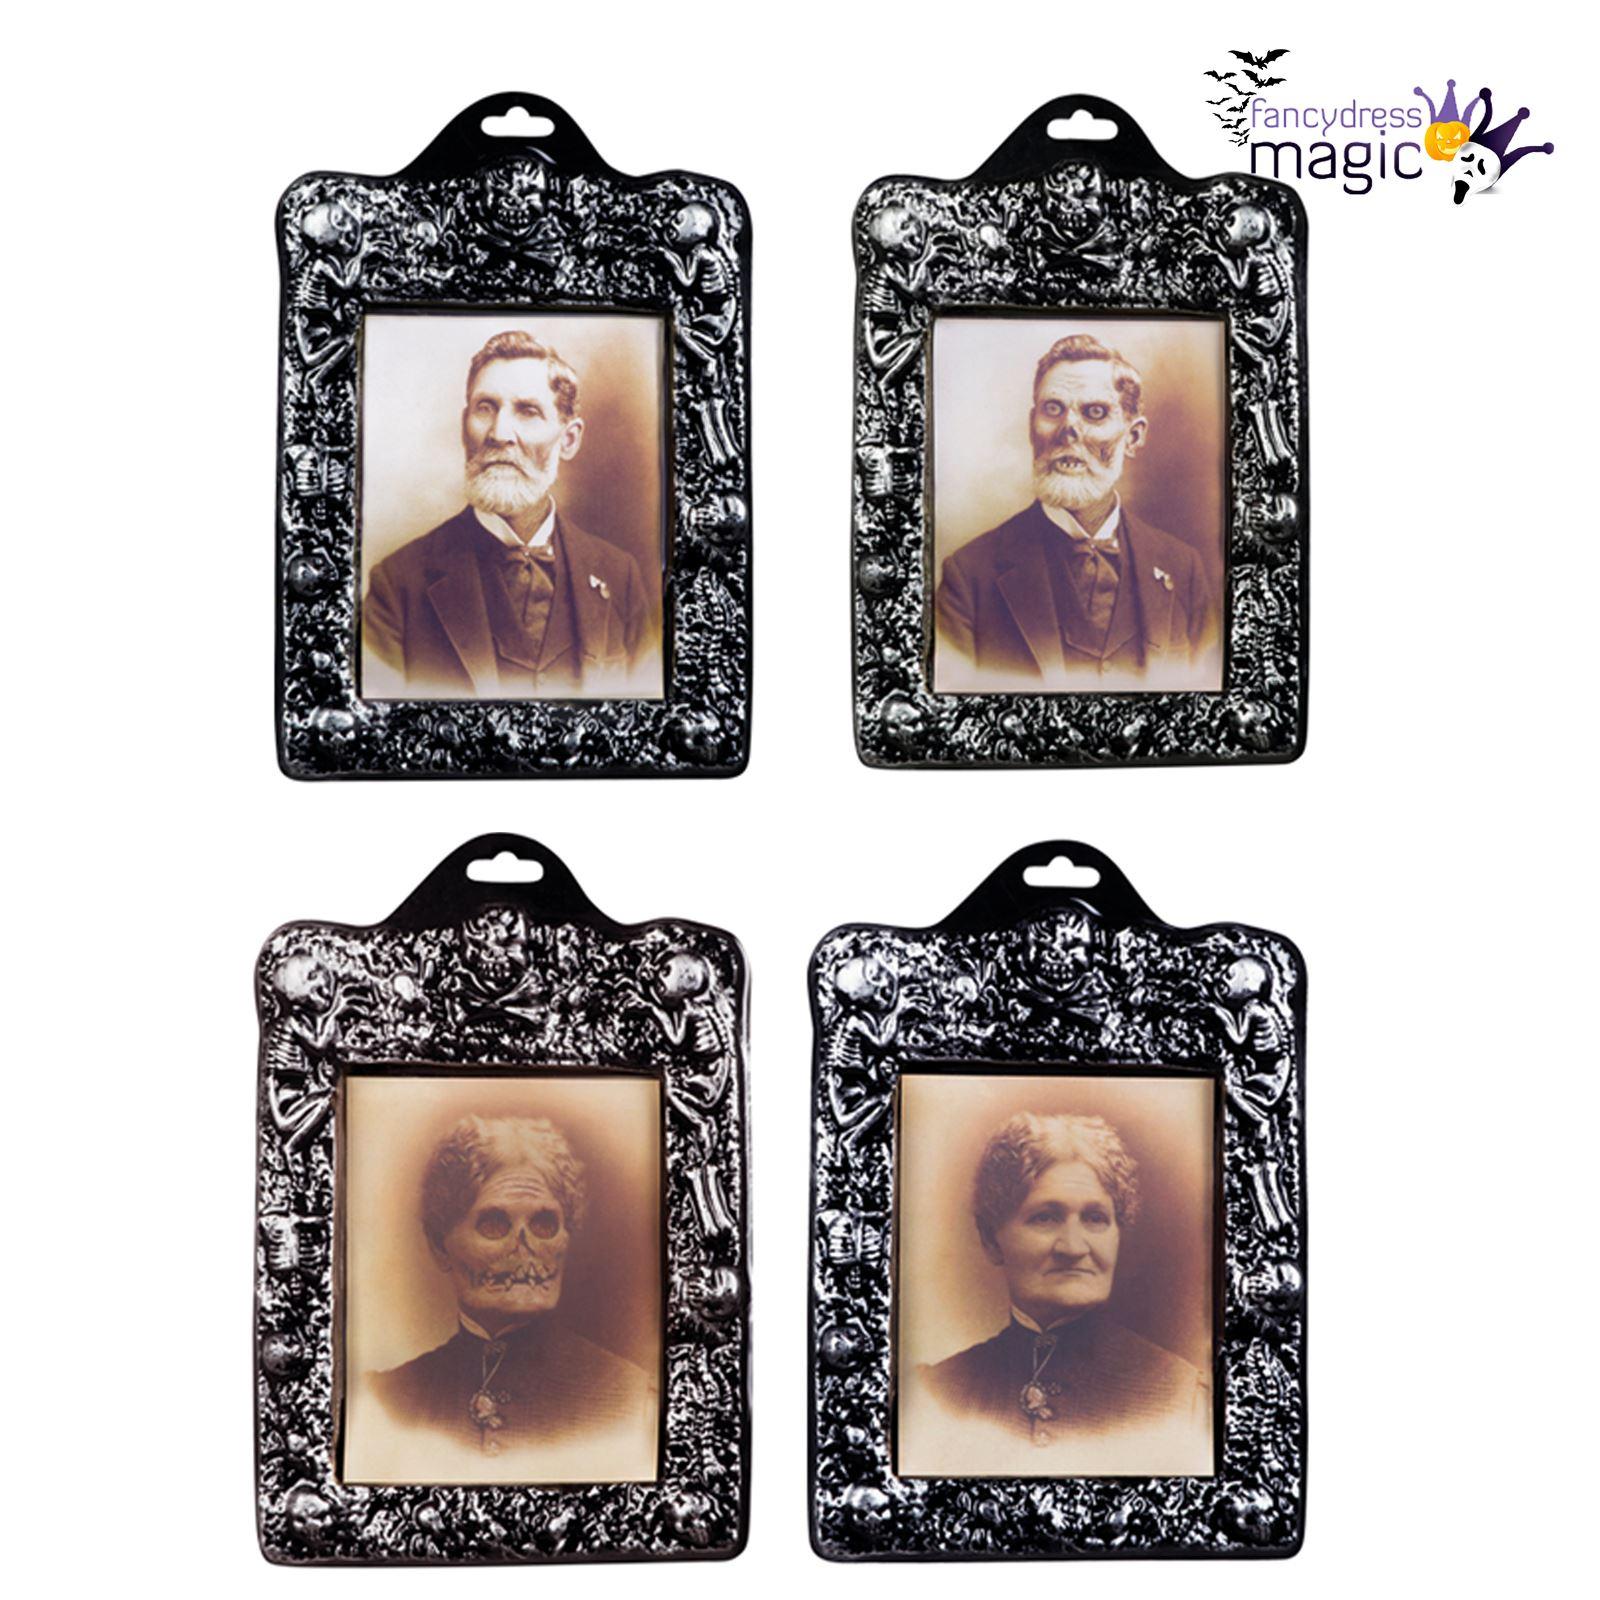 Halloween holographic photo frame portrait changing picture spooky halloween holographic photo frame portrait changing picture spooky decoration jeuxipadfo Images